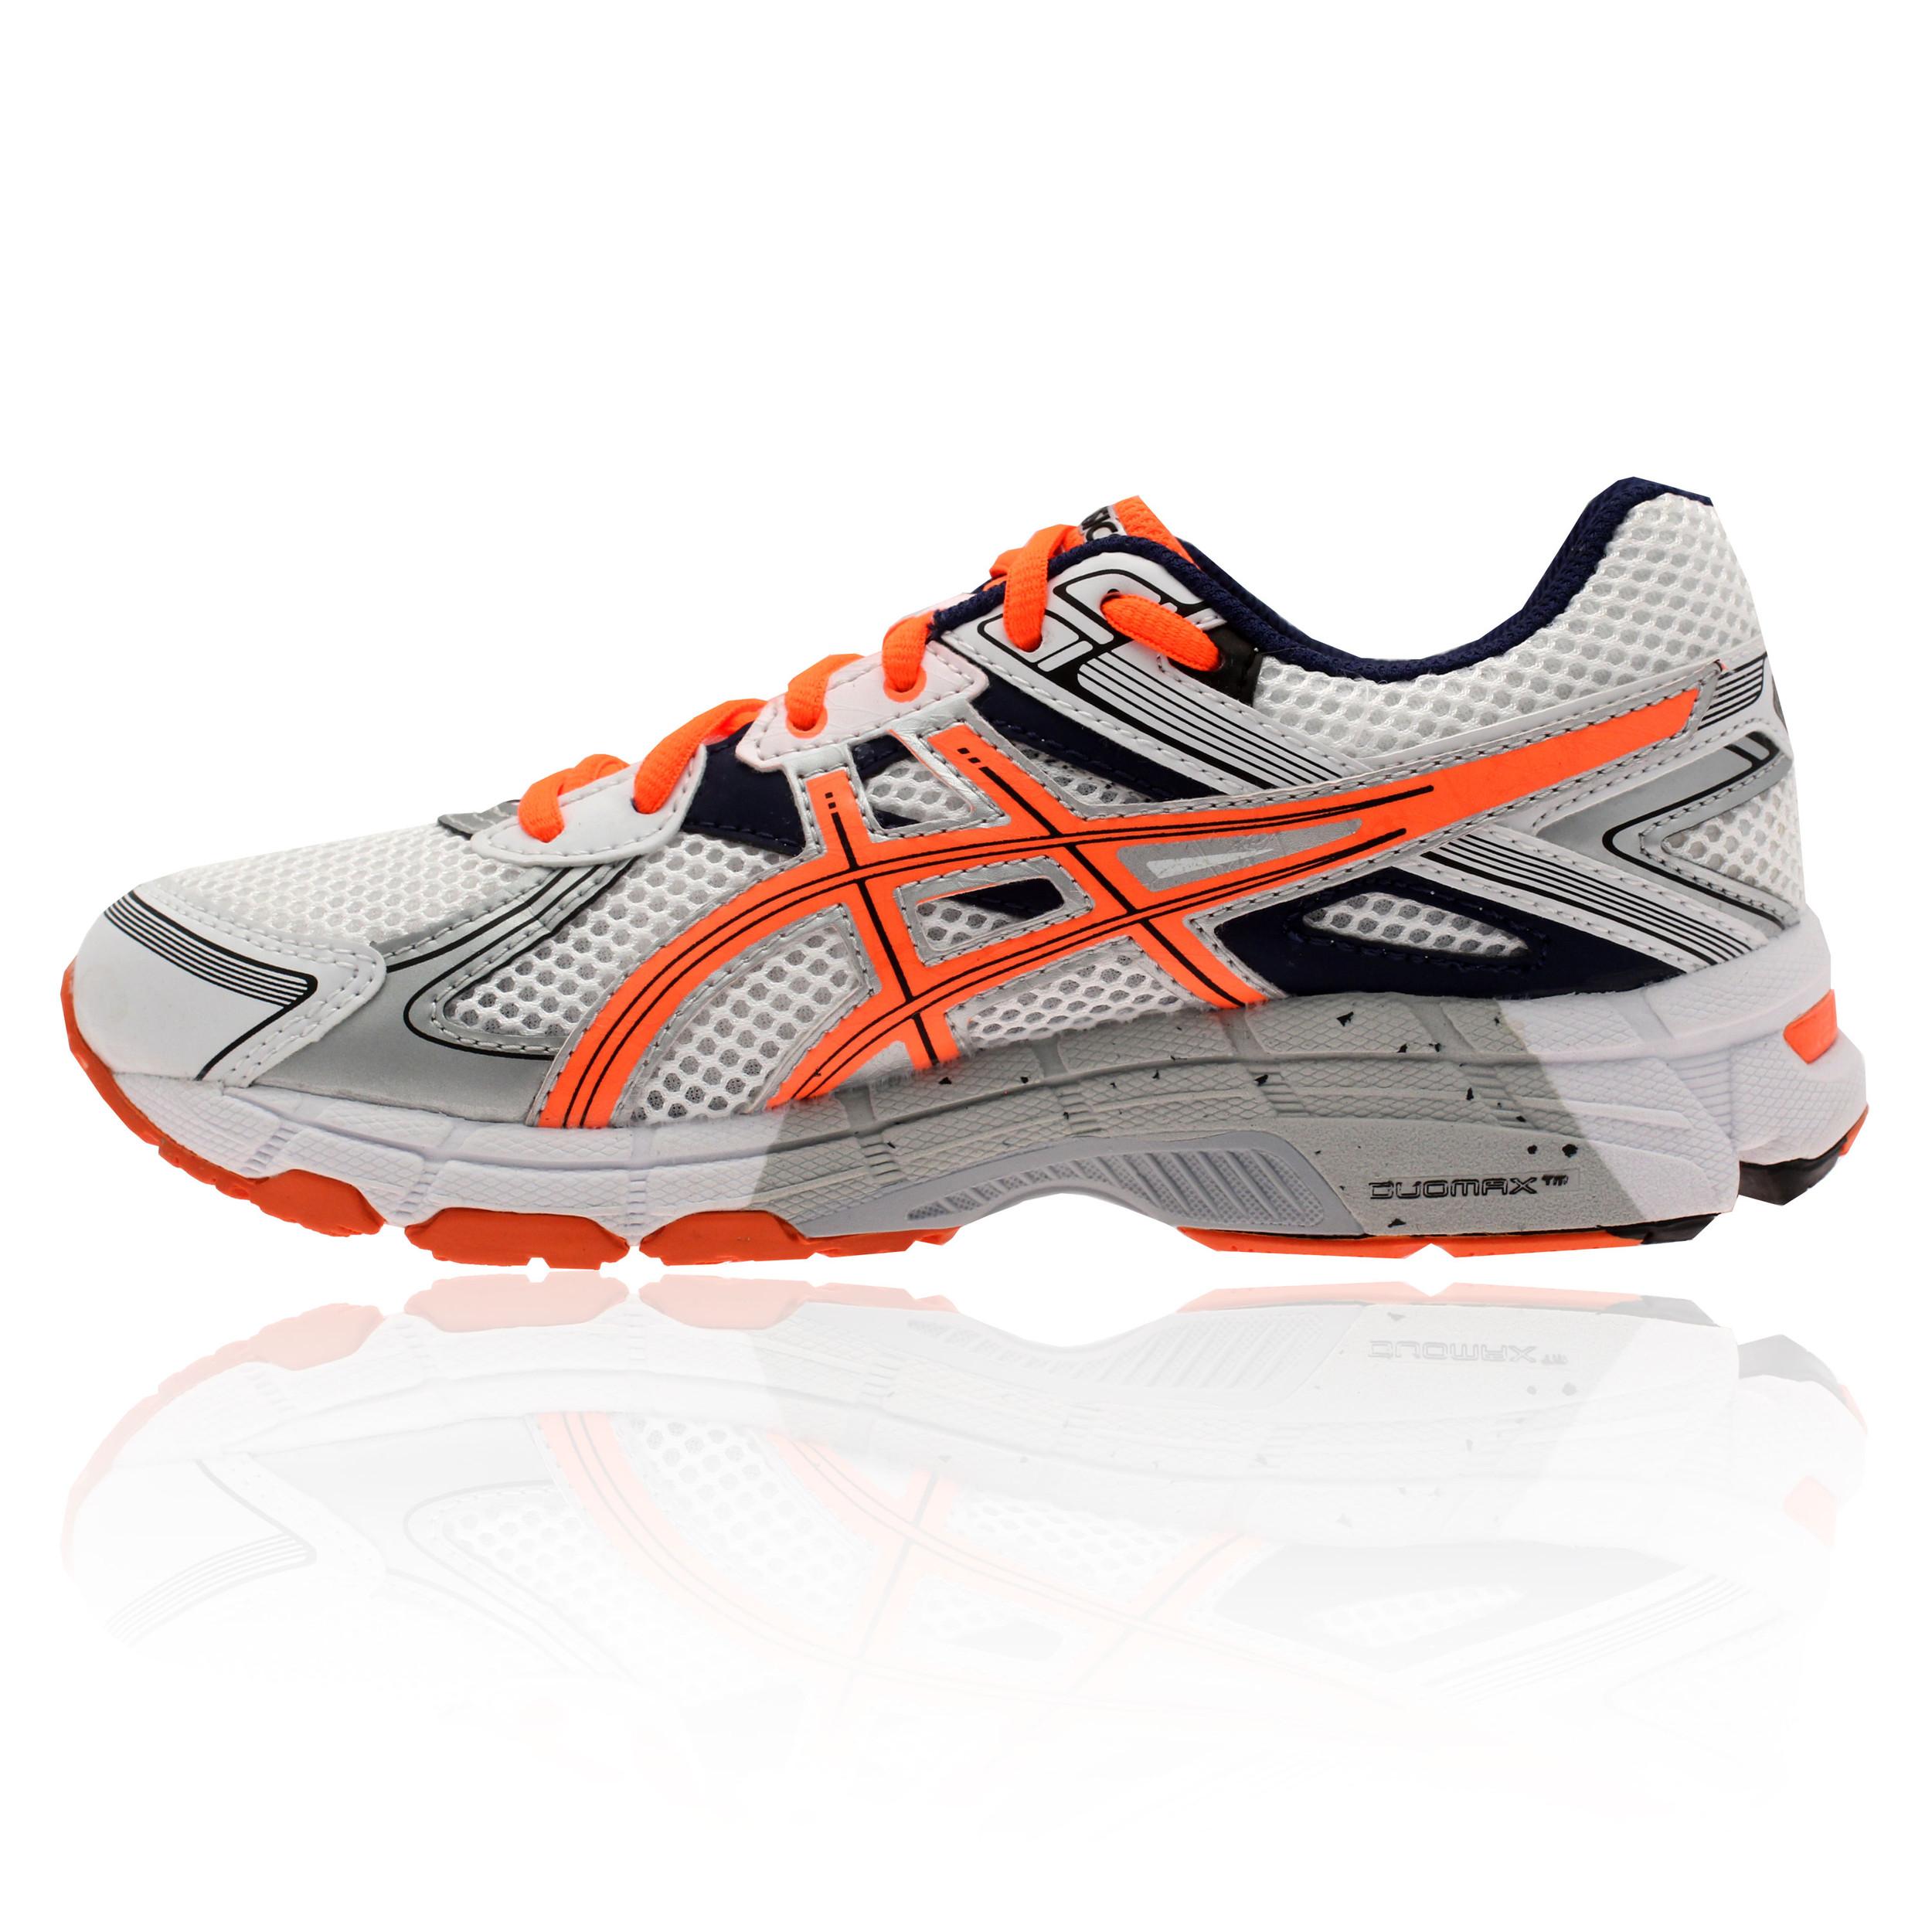 asics gt 1000 2 gs junior running shoes 20 off. Black Bedroom Furniture Sets. Home Design Ideas